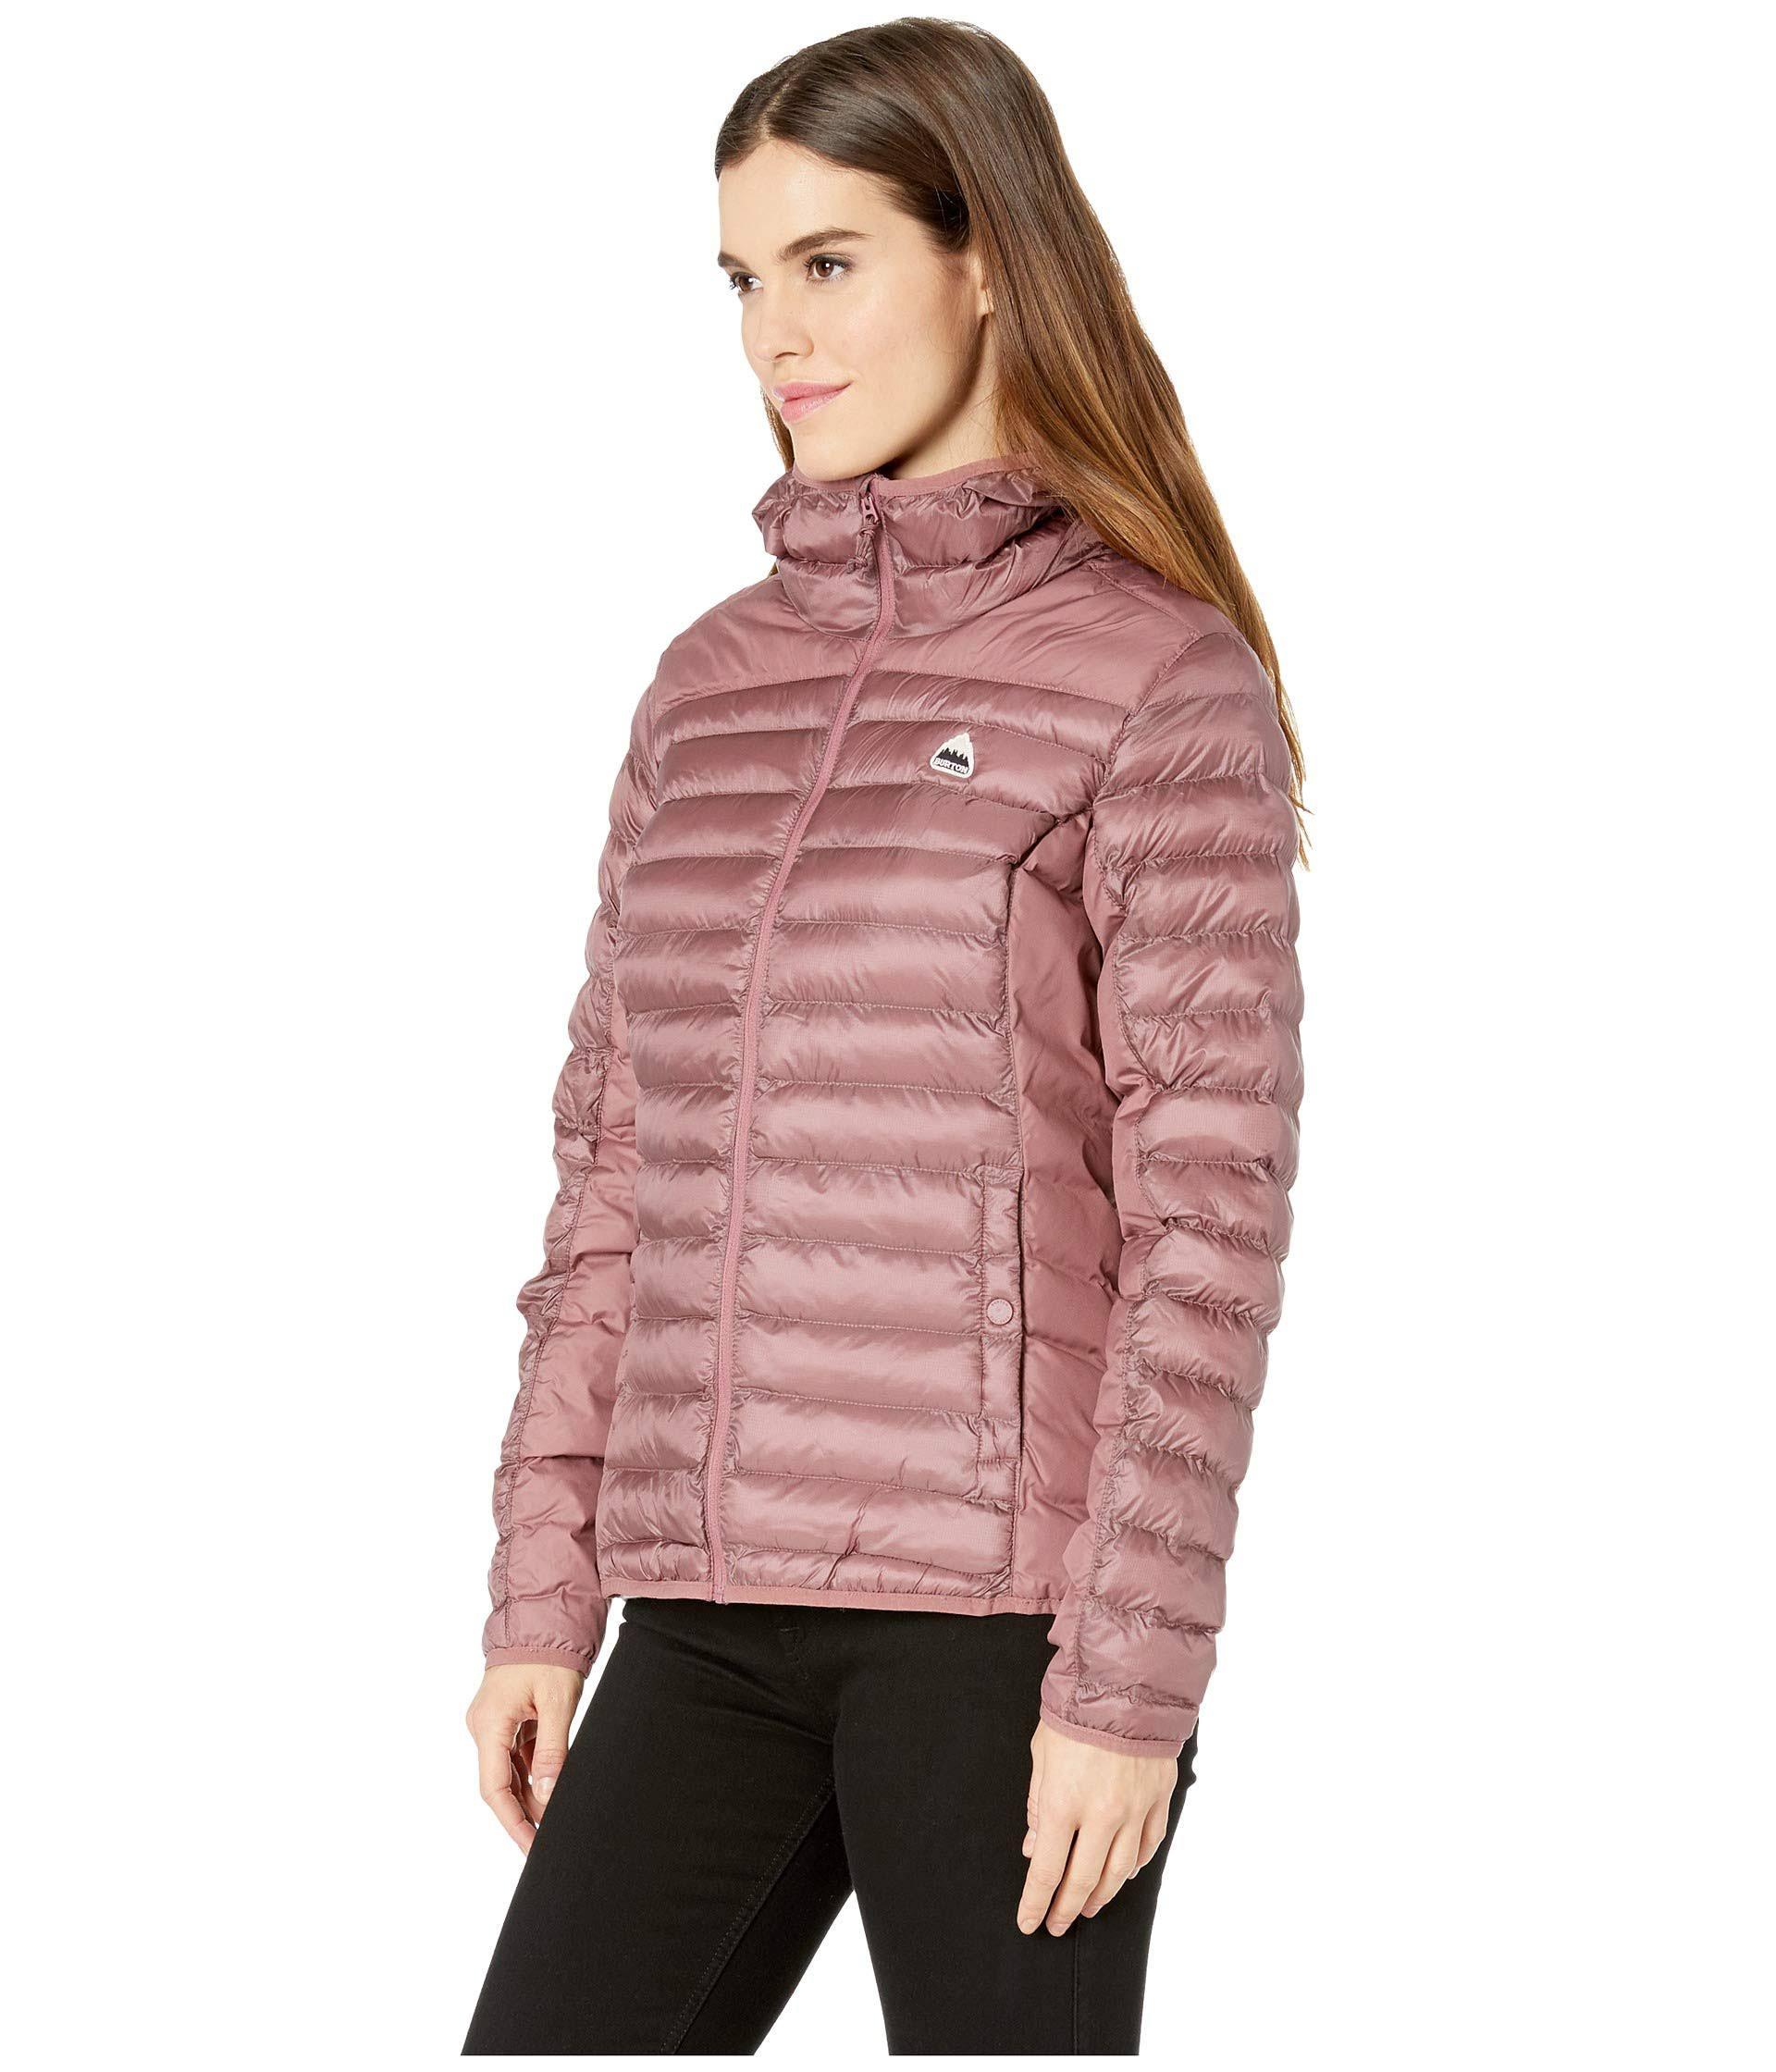 Hooded Jacket Evergreen Insulator Burton Synth Frauen PZvEWTng